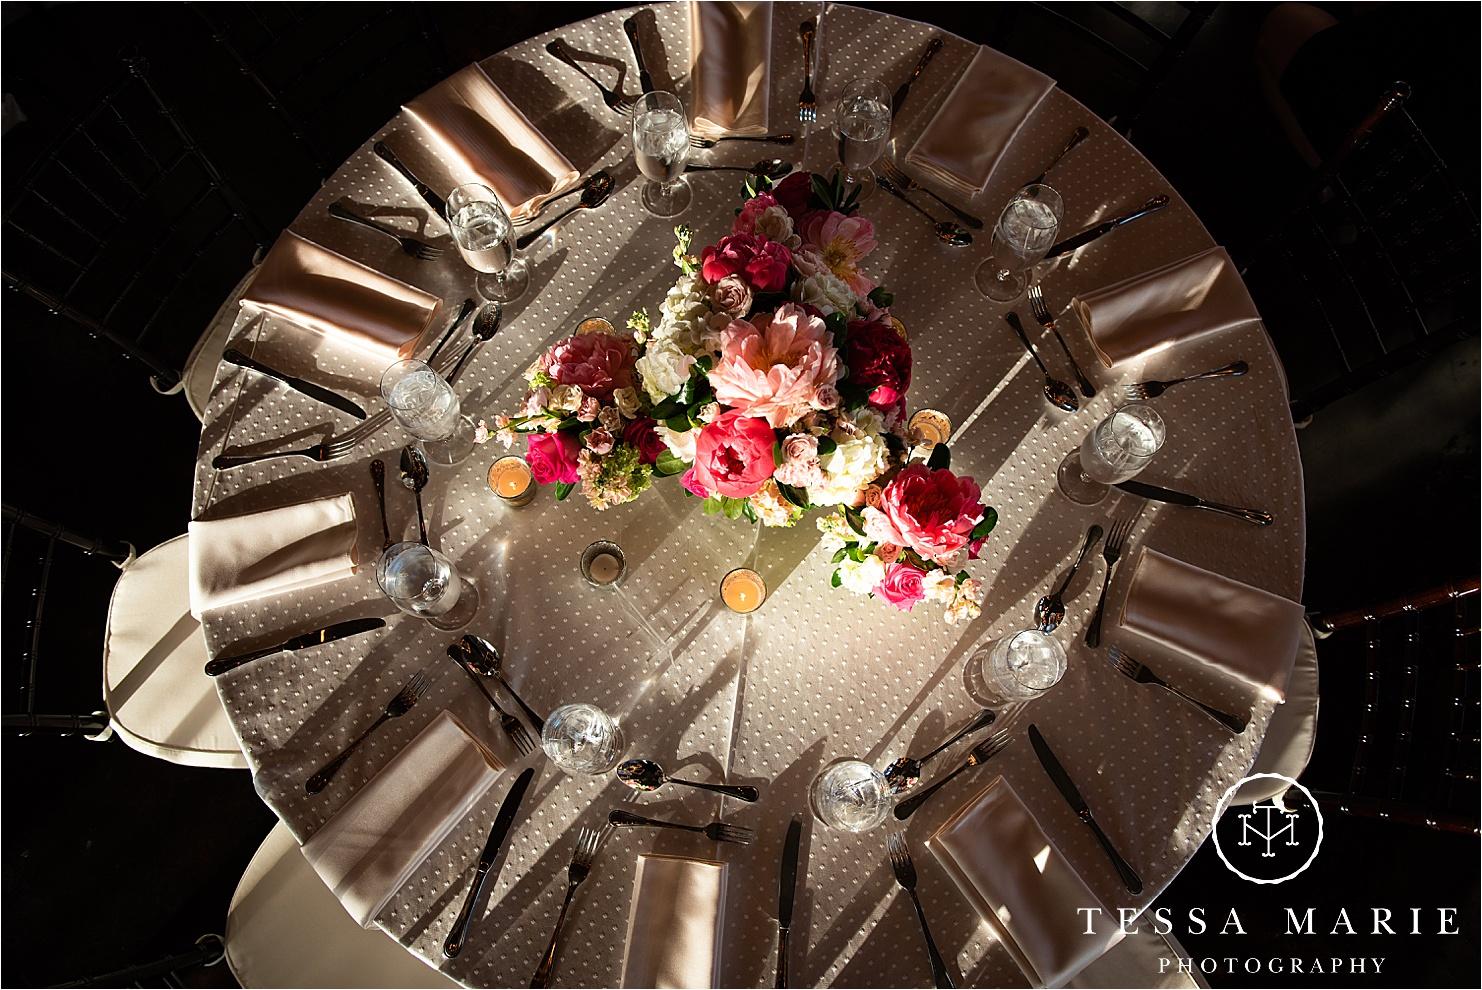 Tessa_marie_weddings_houston_wedding_photographer_The_astorian_0141.jpg